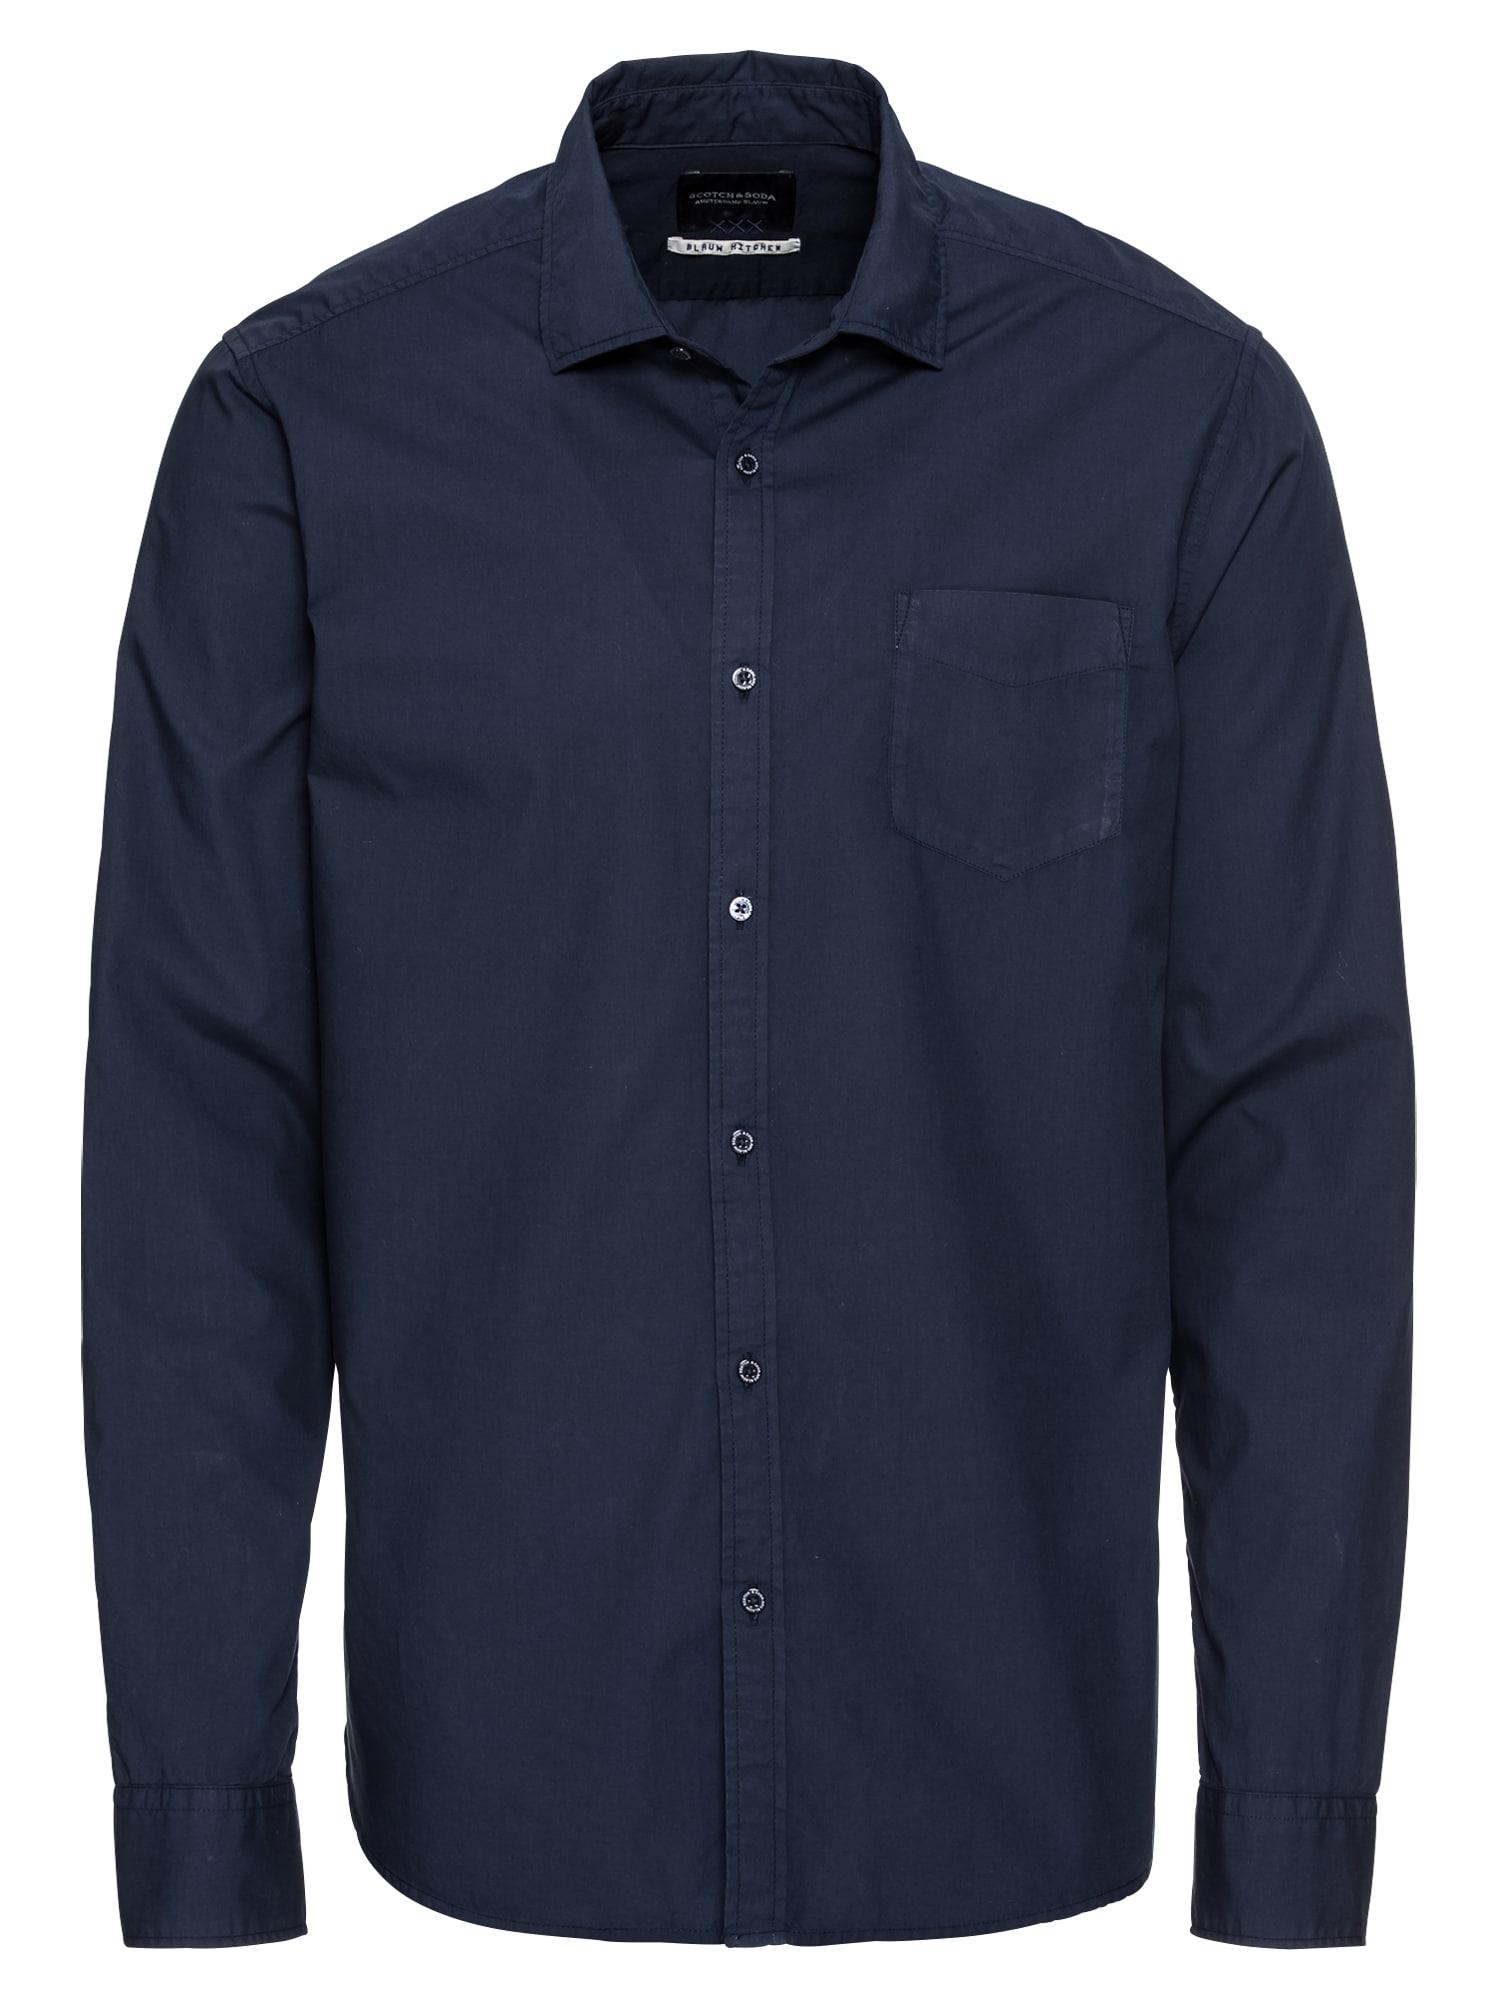 SCOTCH  and  SODA Heren Overhemd Ams Blauw lightweight  donkerblauw